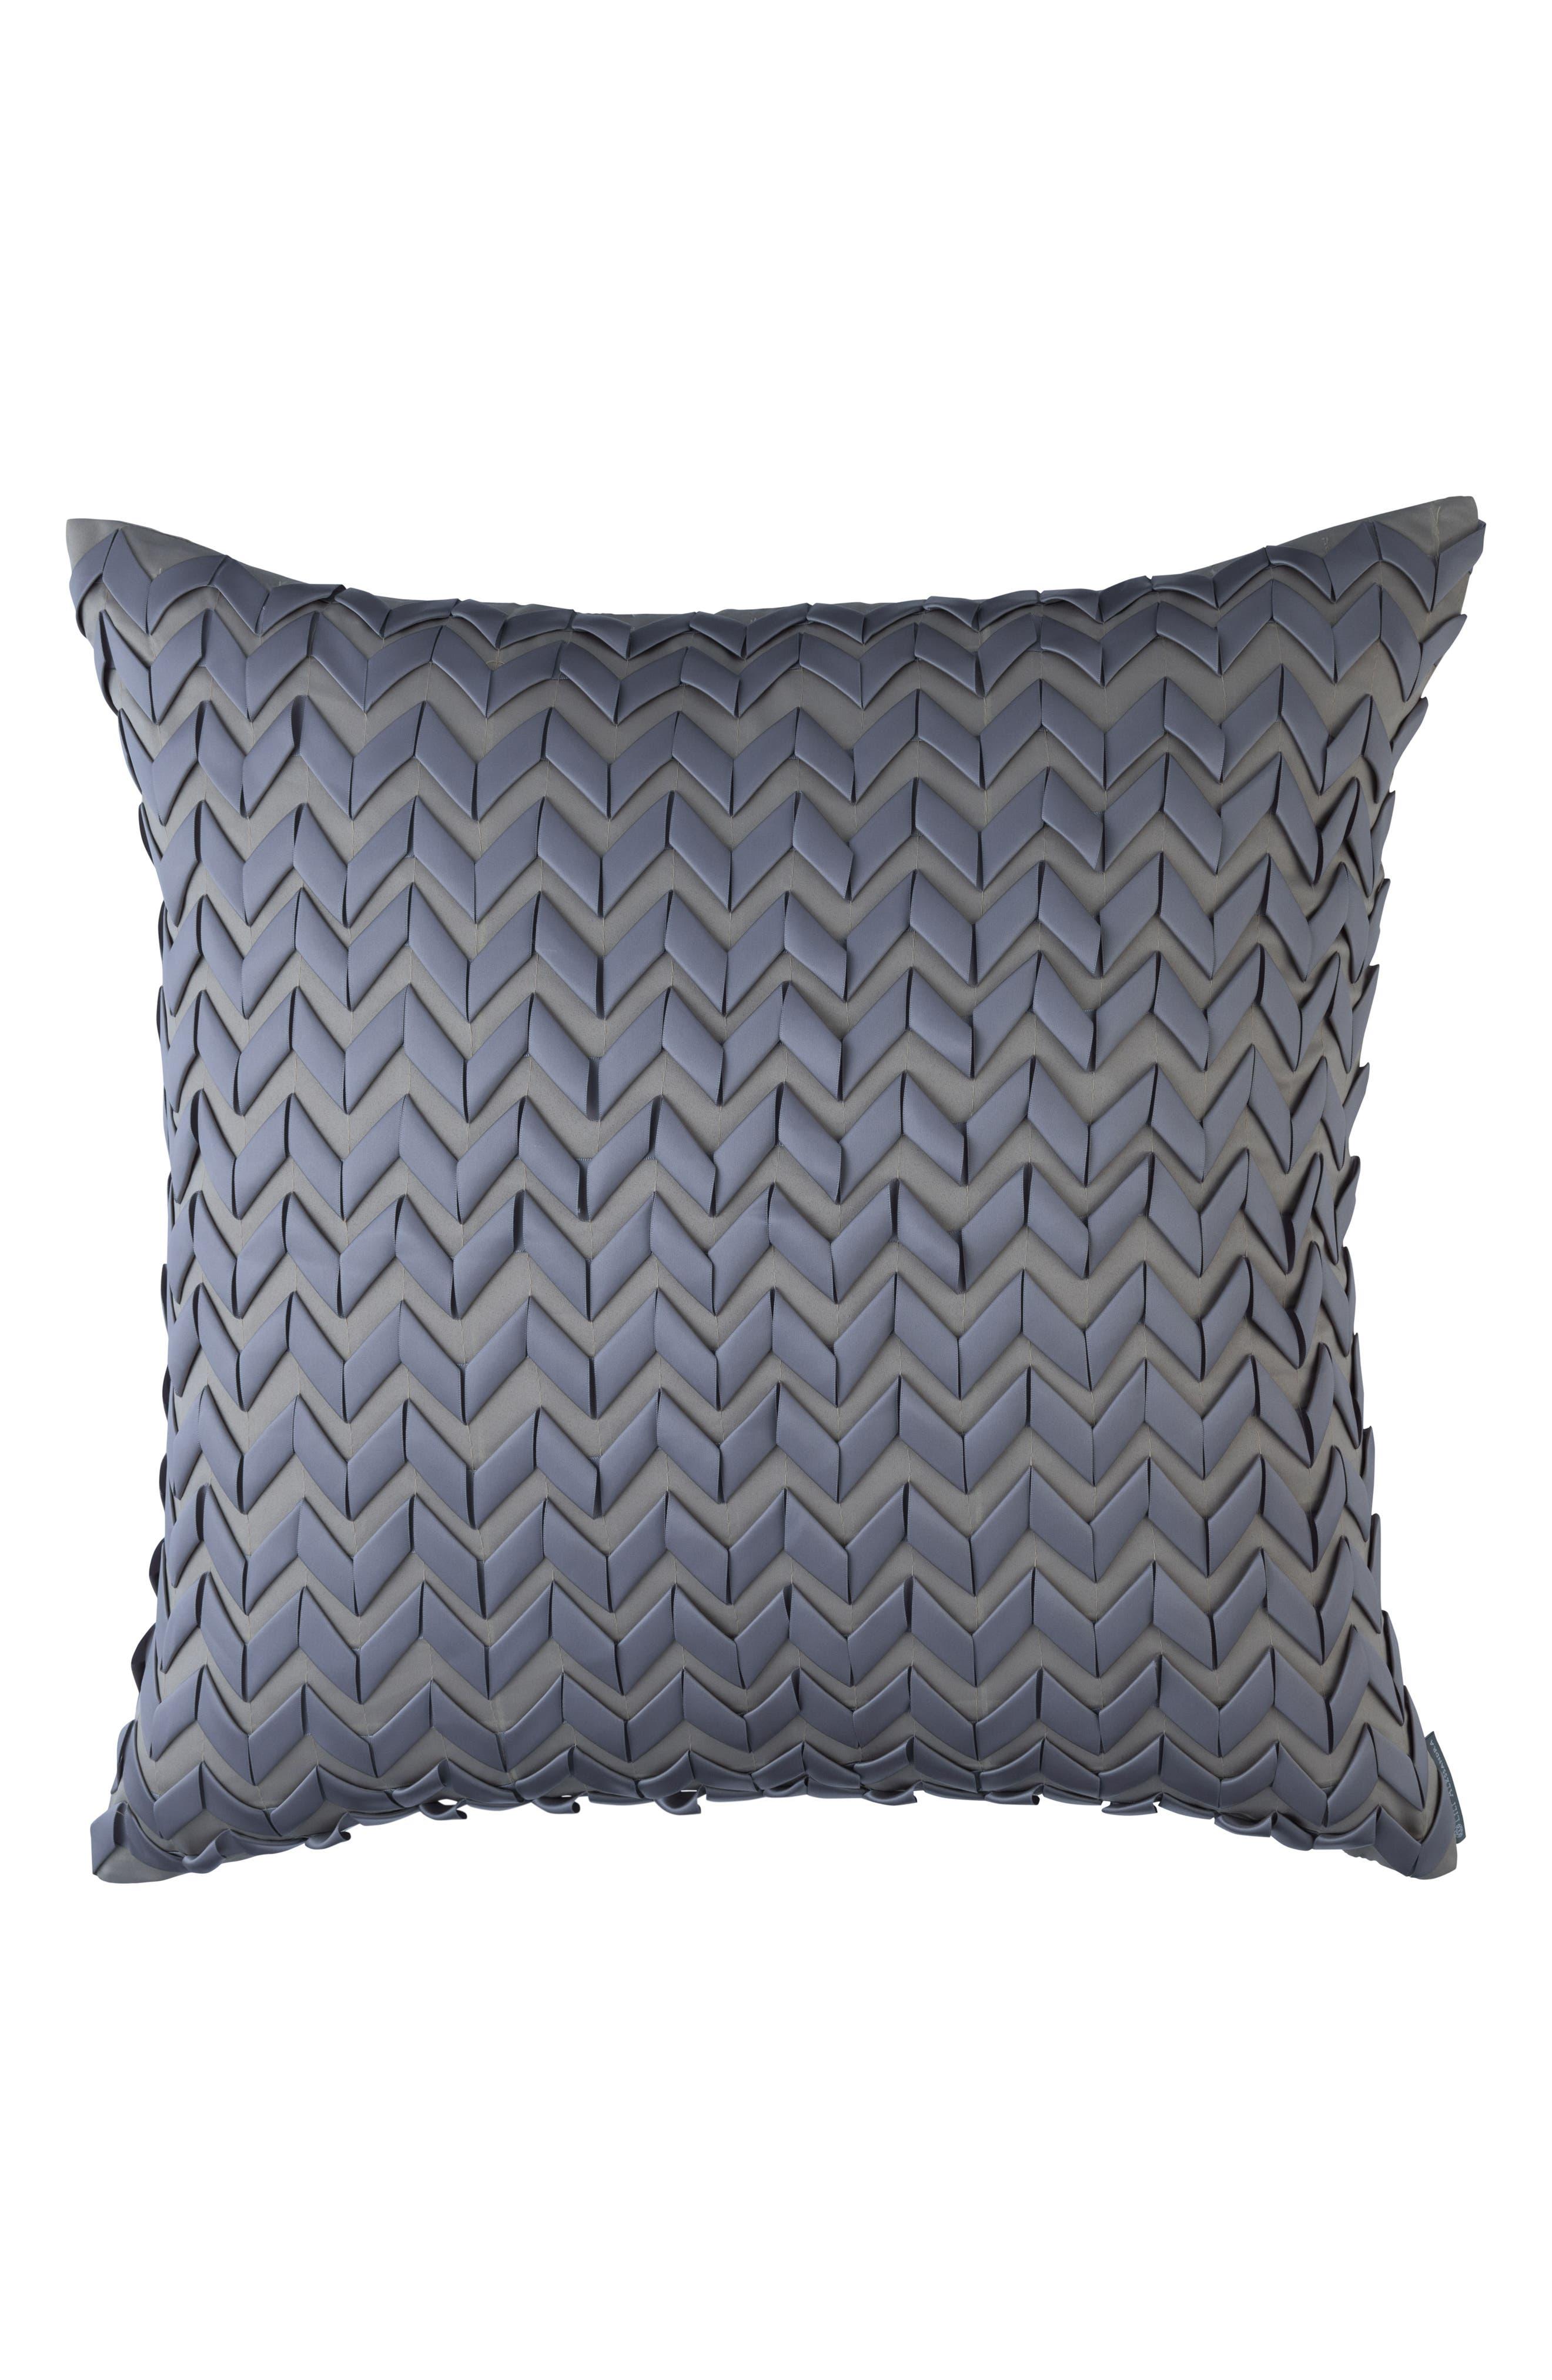 Ultra Ribbon Accent Pillow,                             Main thumbnail 1, color,                             020